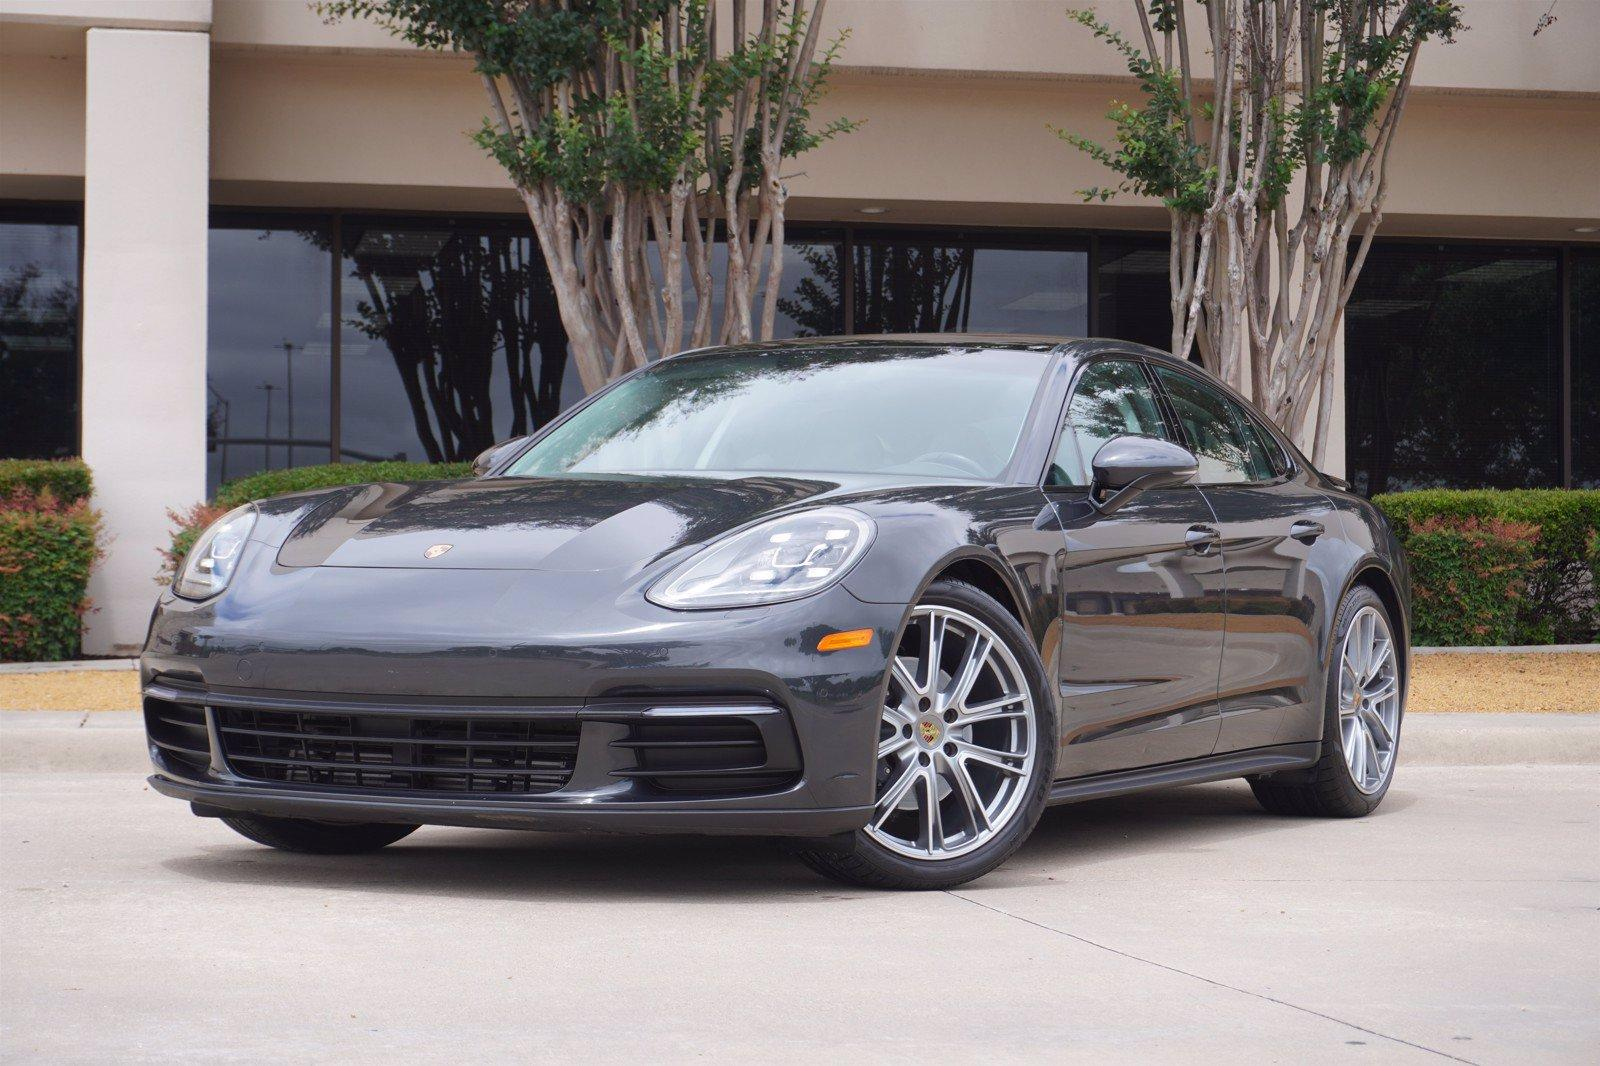 2018 Porsche Panamera Vehicle Photo in Grapevine, TX 76051